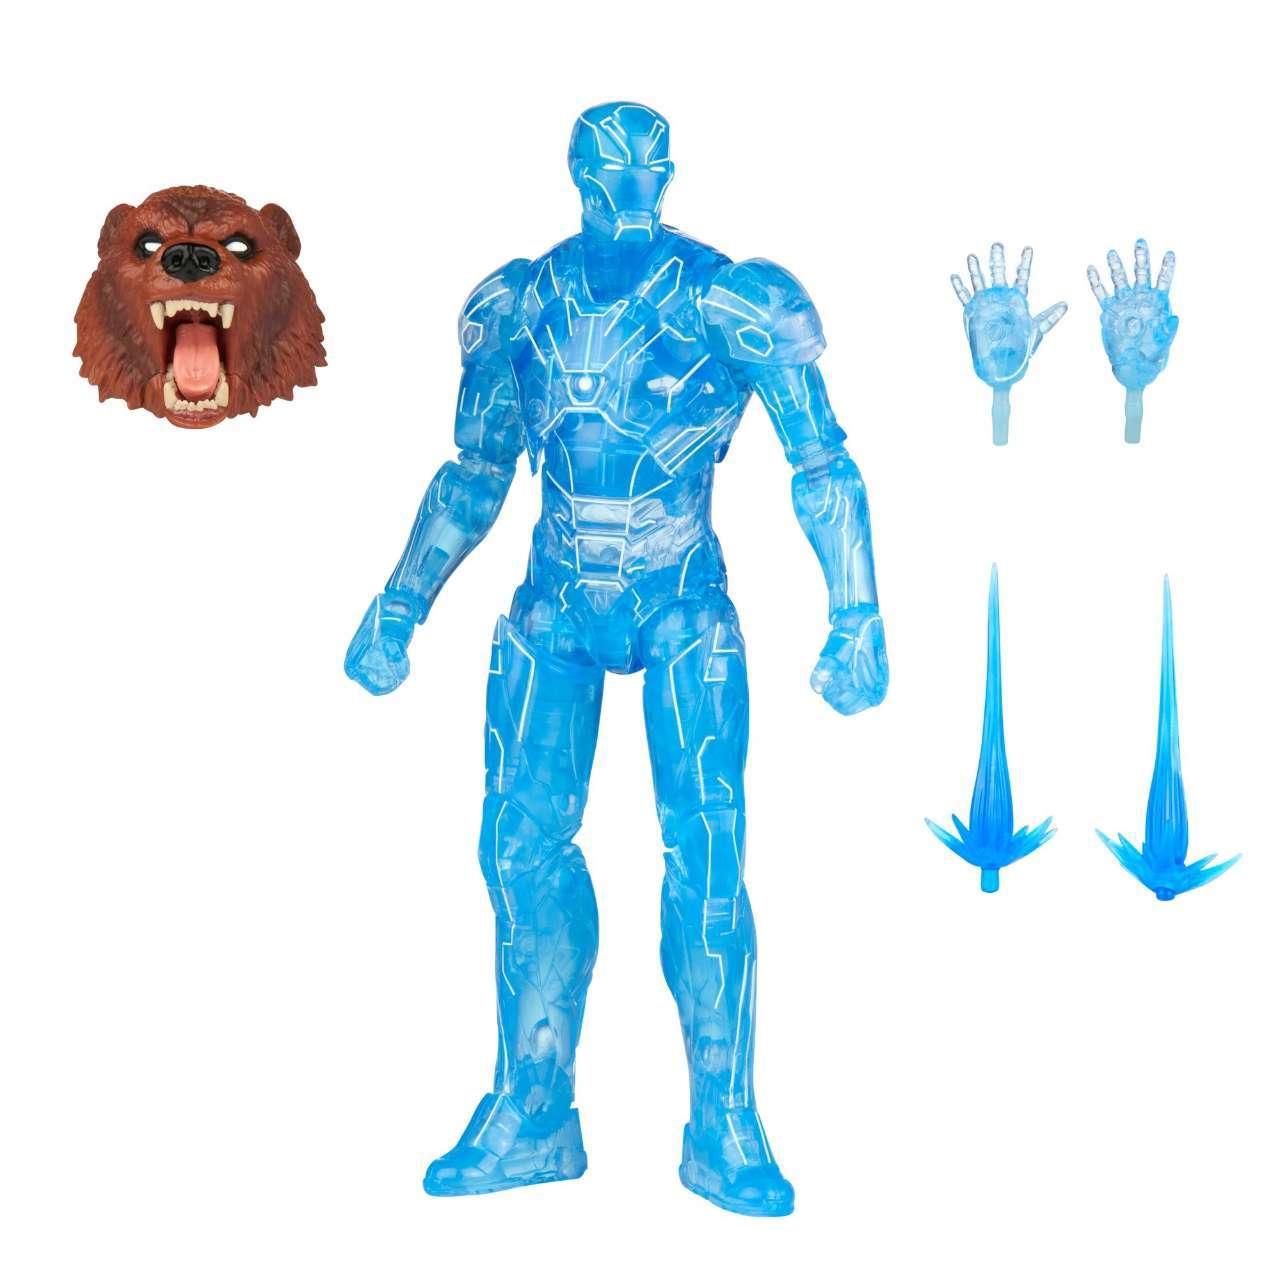 hologram-iron-man